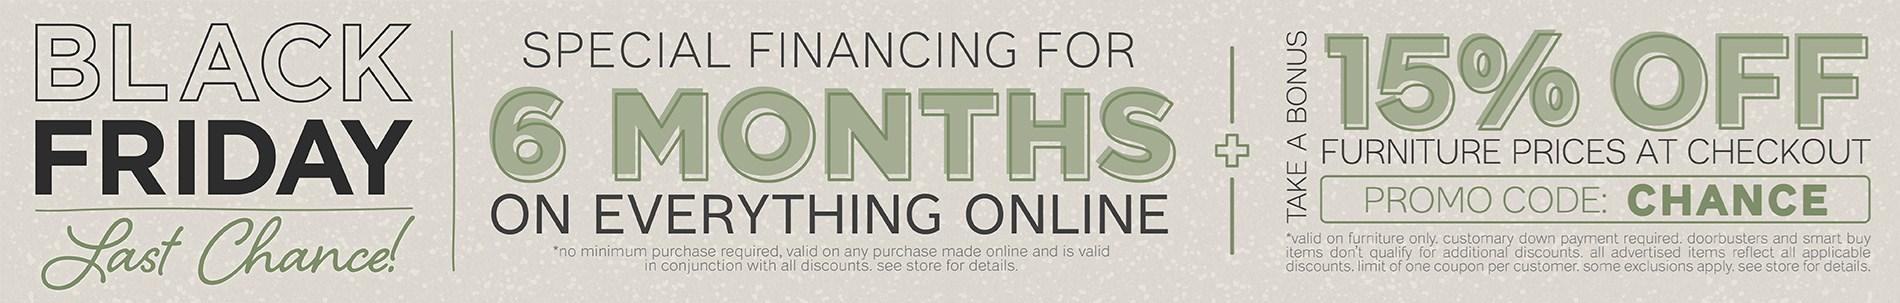 Furnitur & ApplianceMart Black Friday Last Chance Sale